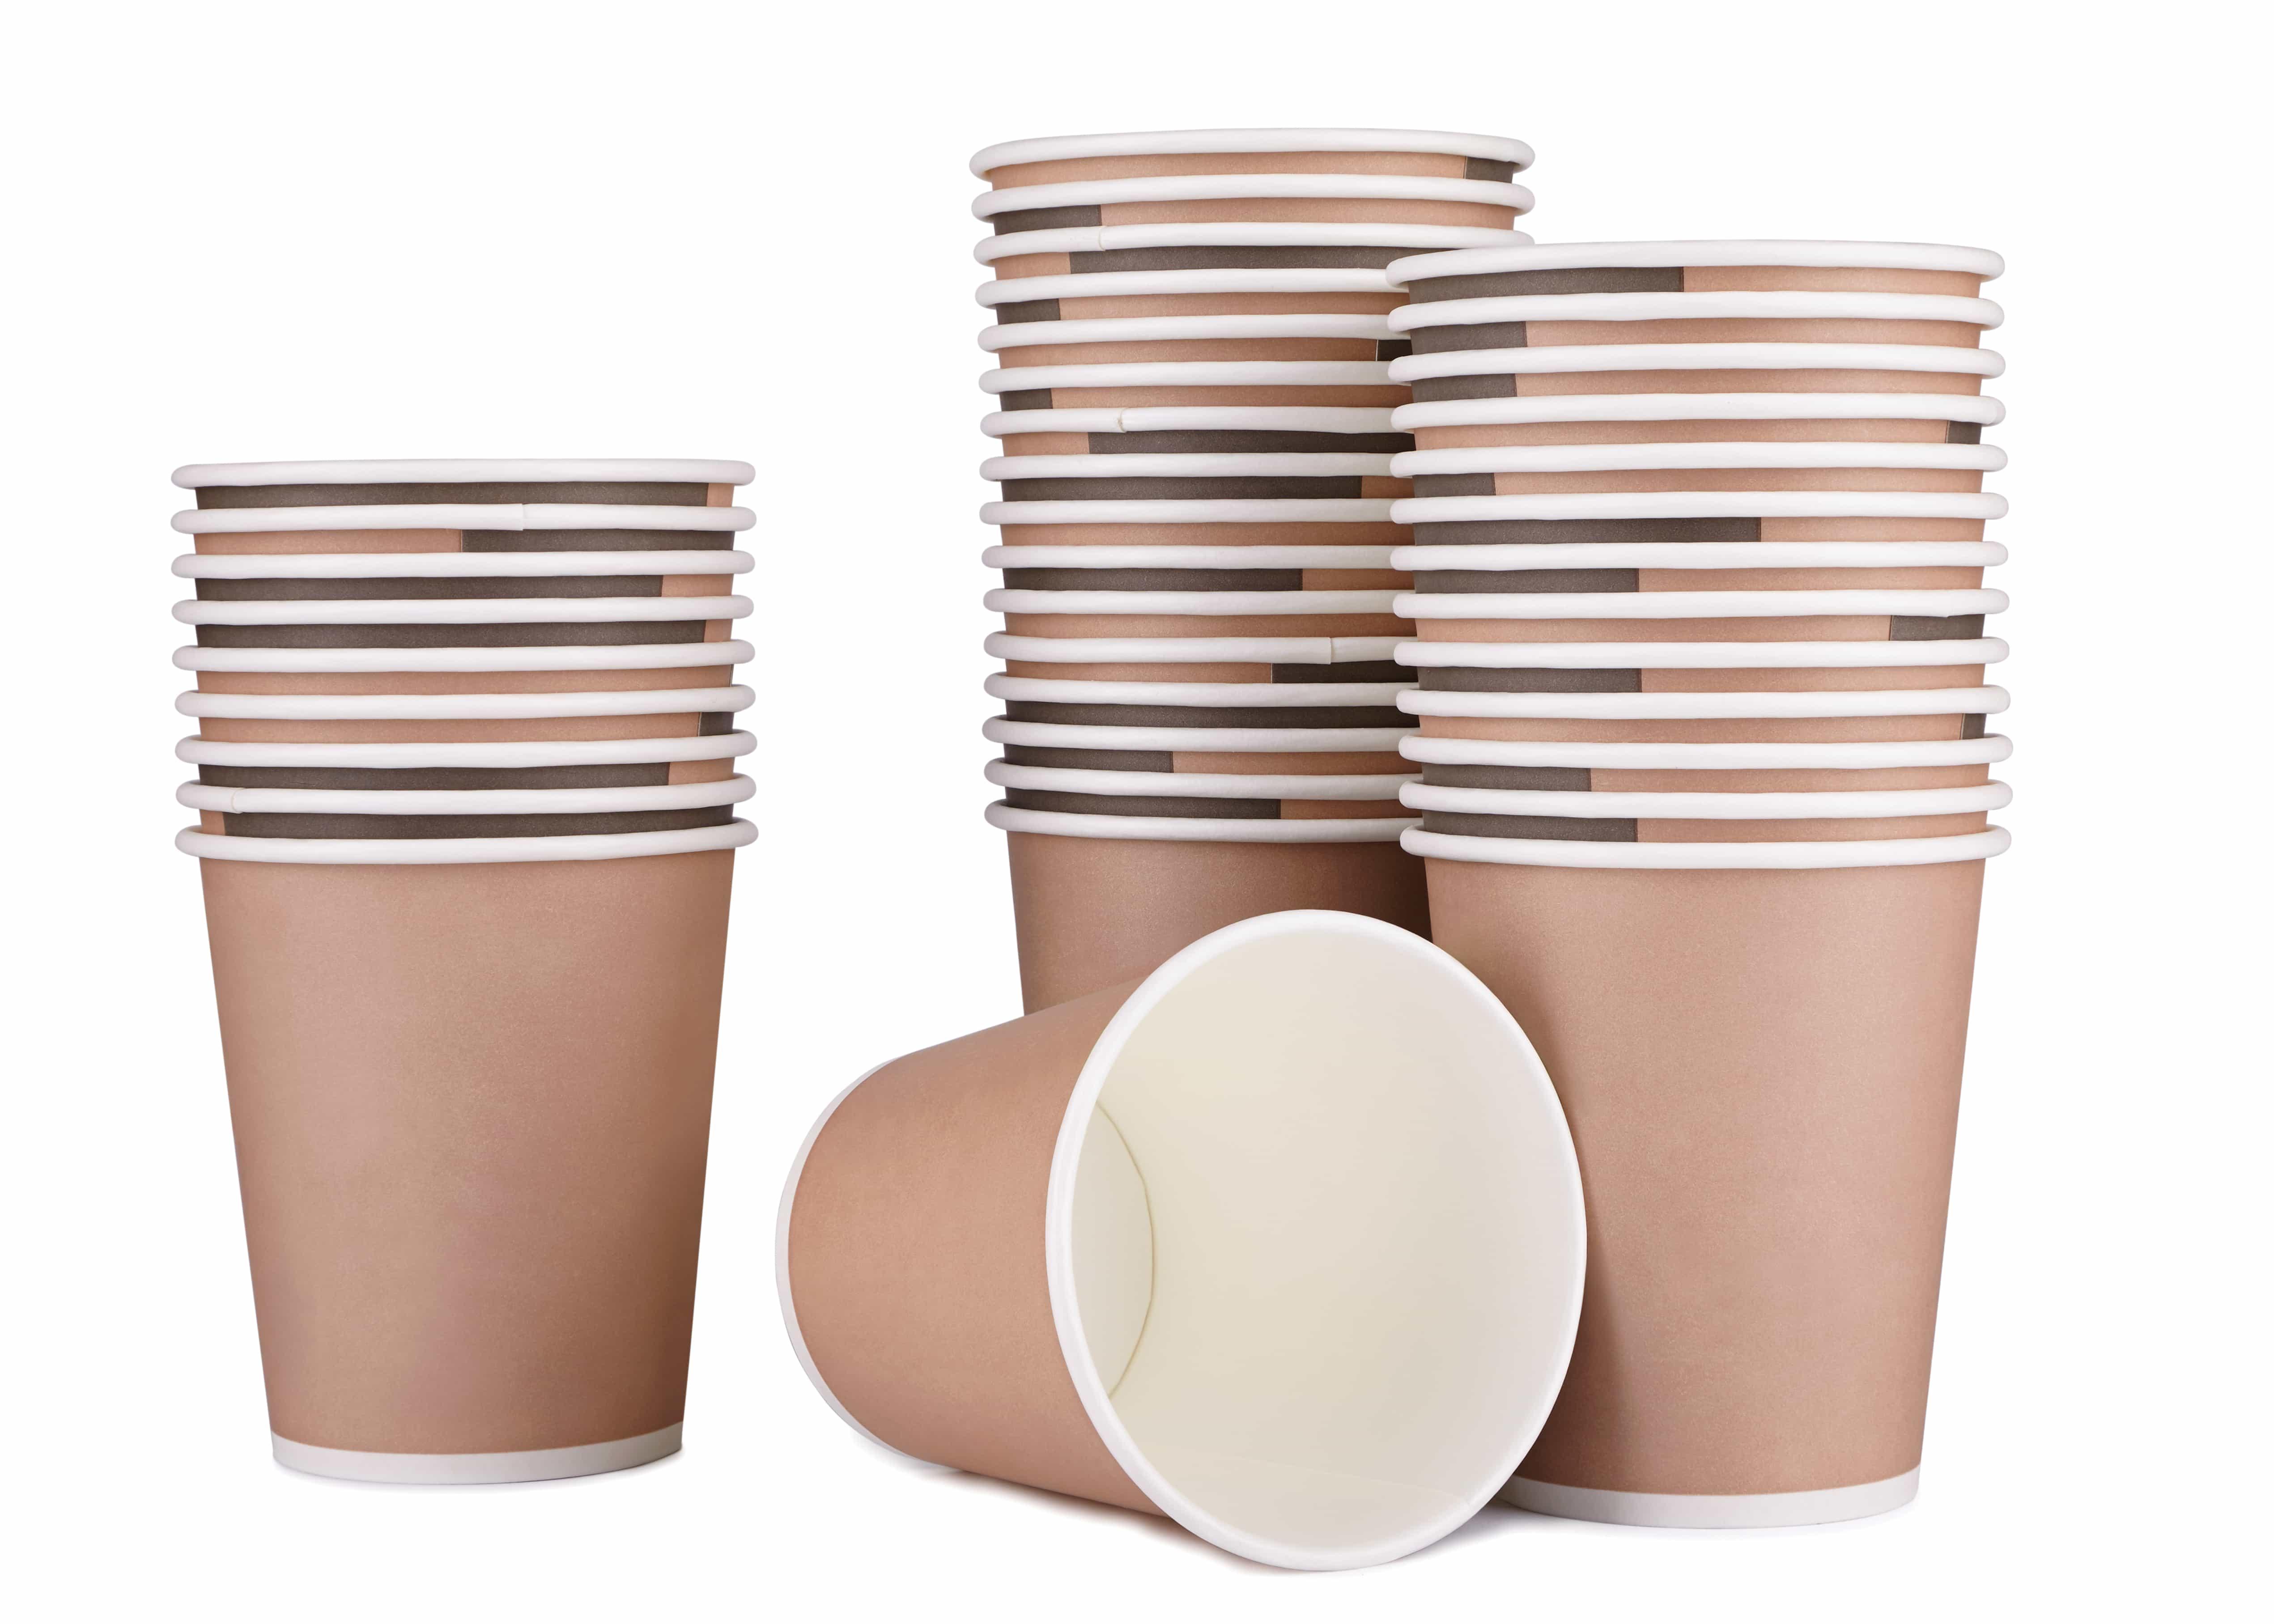 paper cups - A Dirty Secret